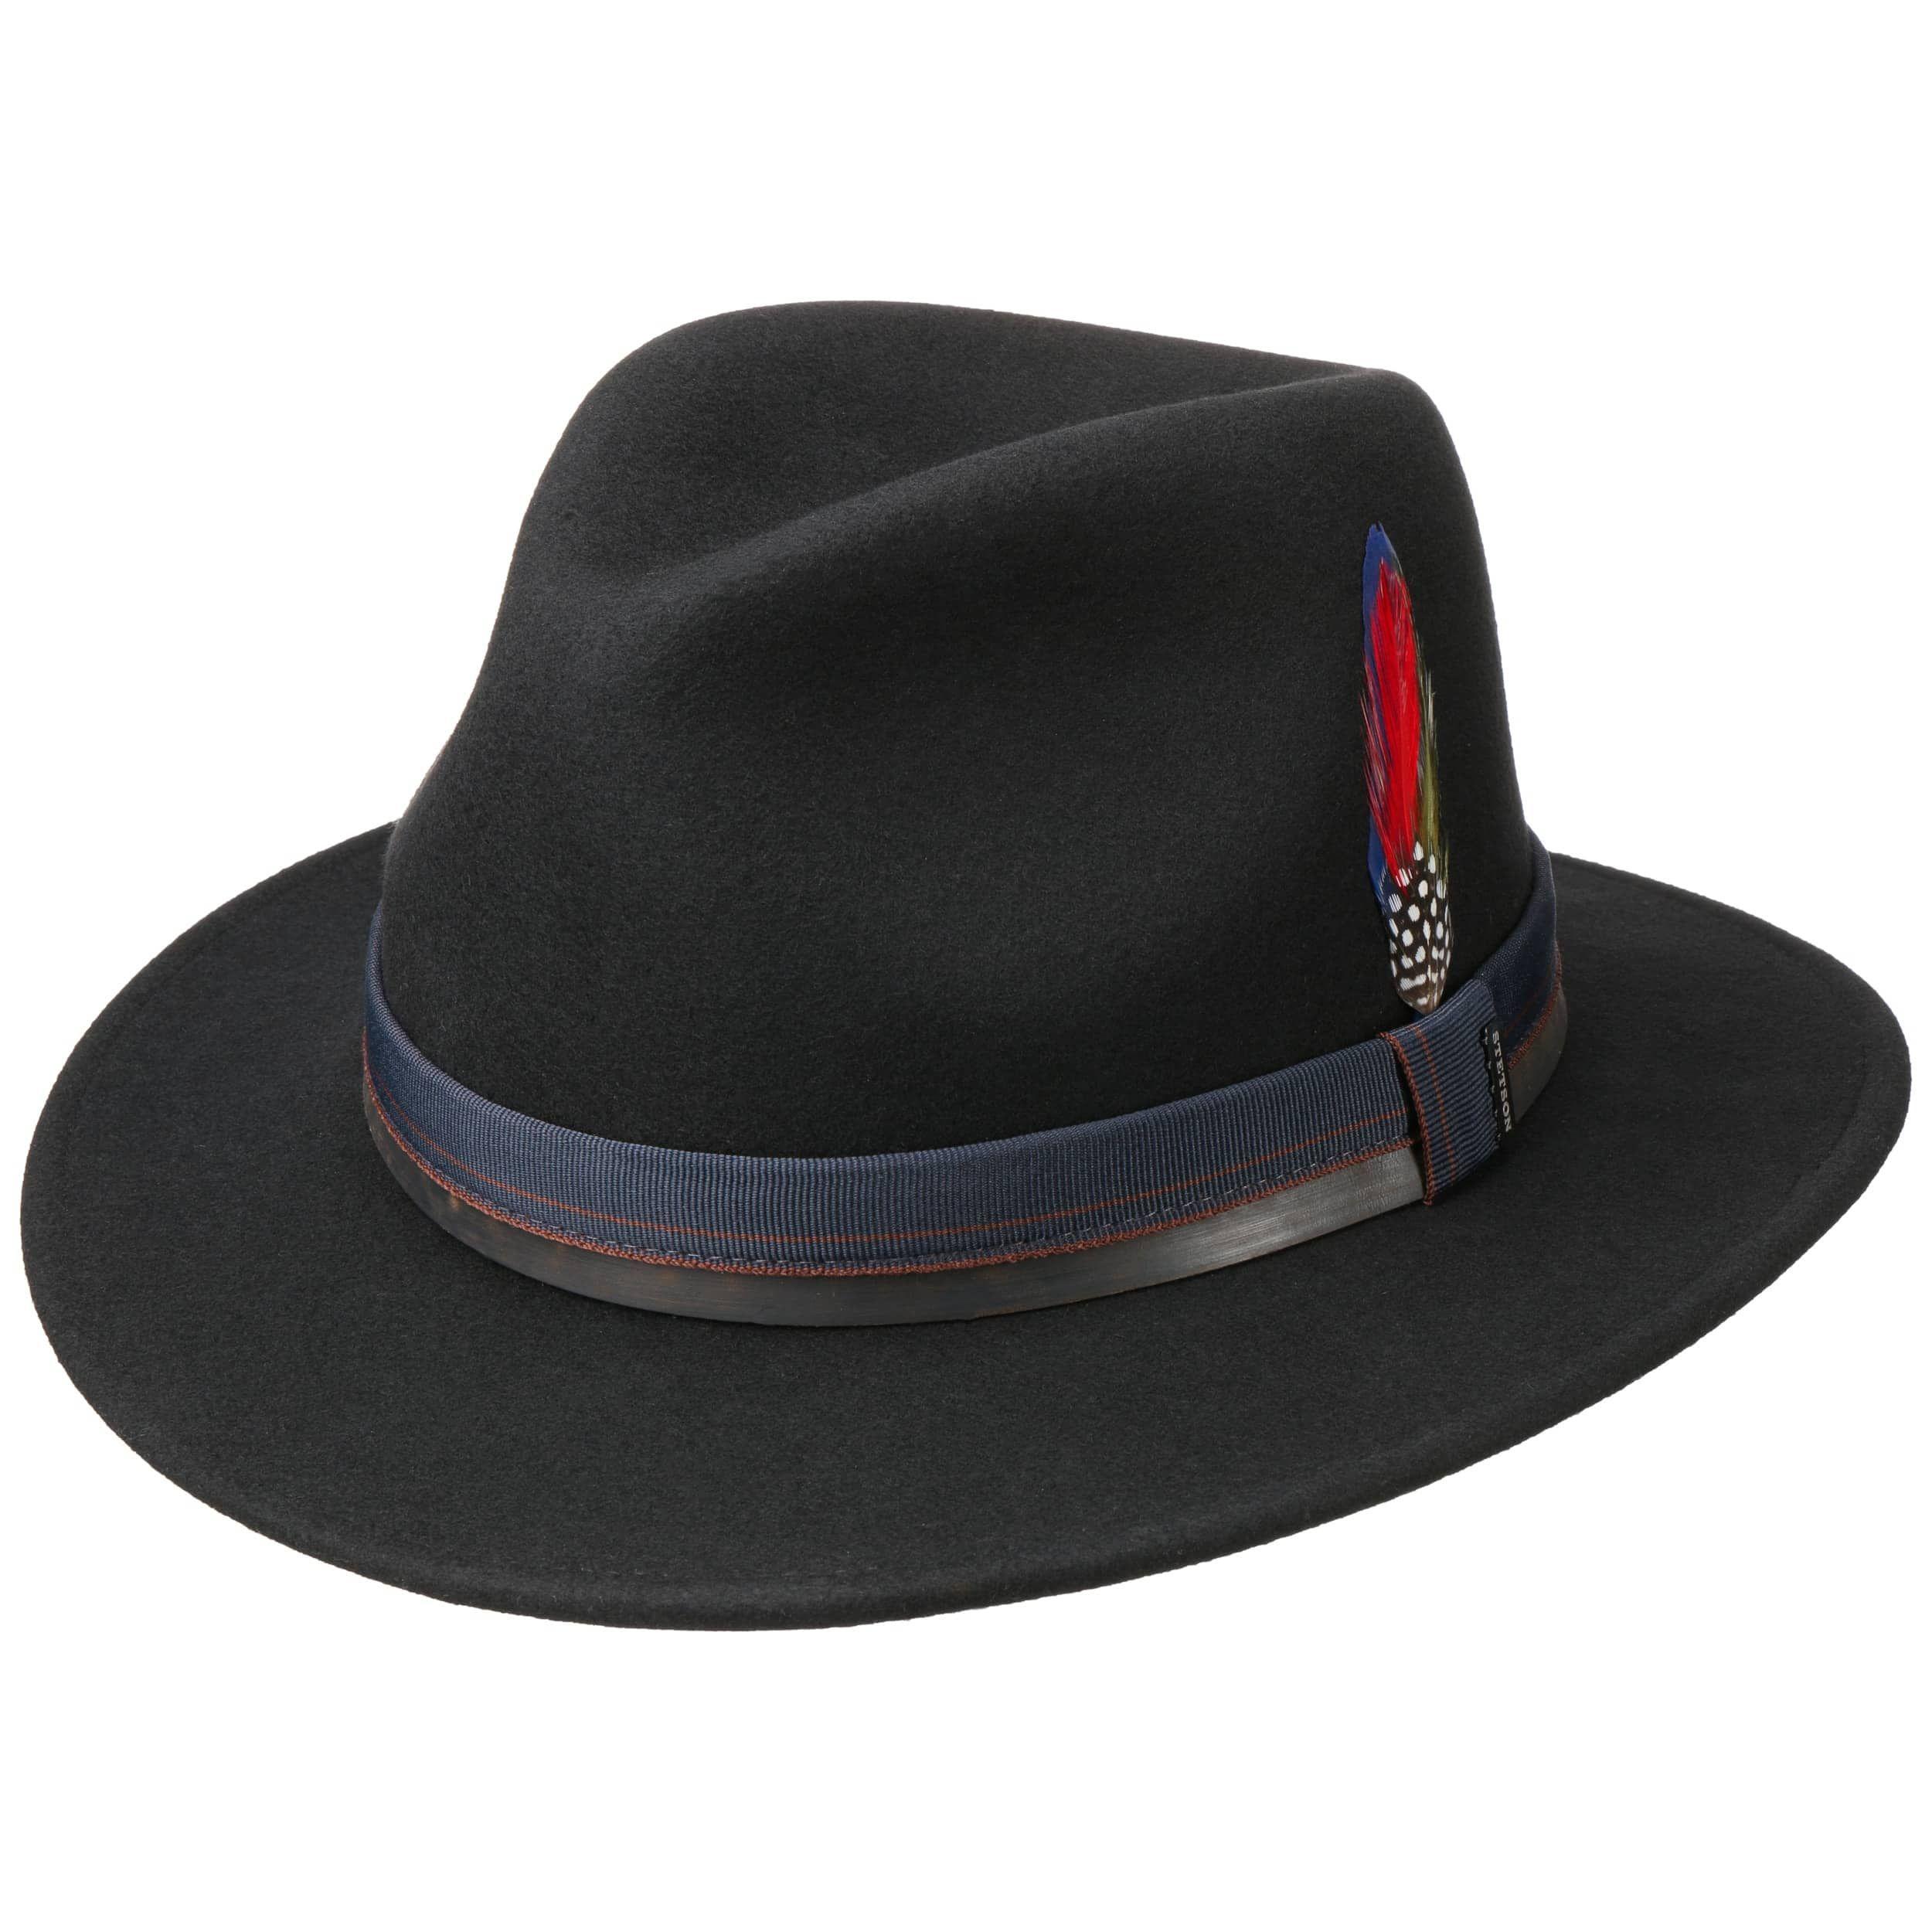 Sombrero de Fieltro Parlesto Traveller negro